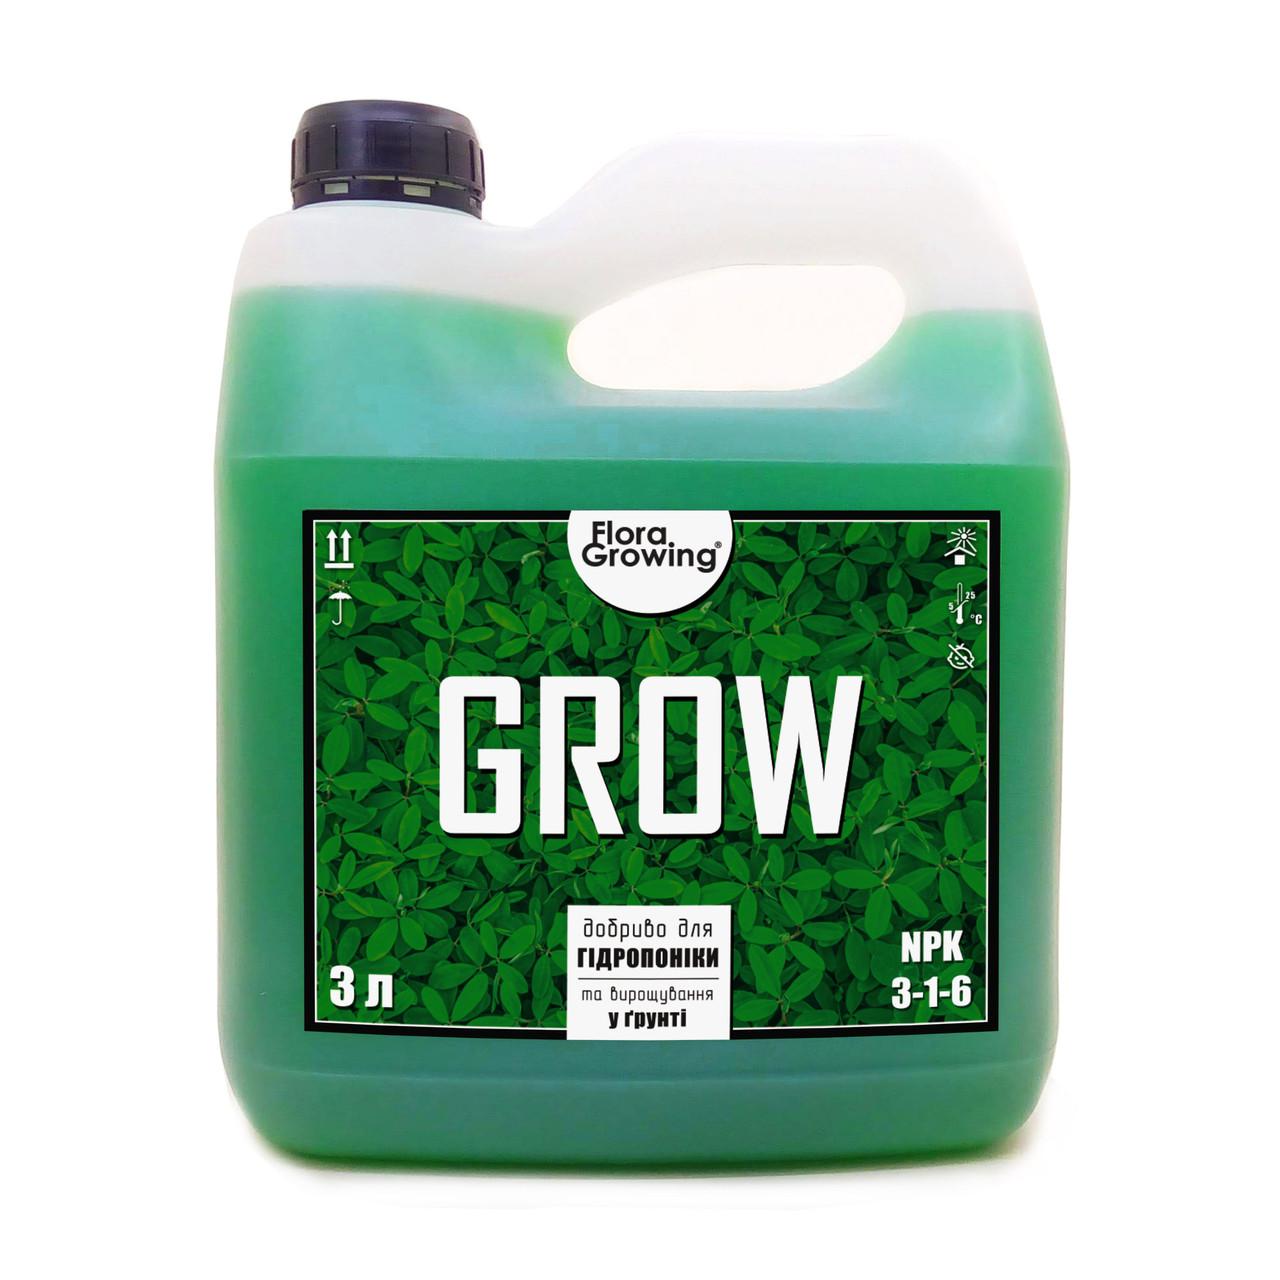 3 л Grow - компонент удобрений для гидропоники и почвы аналог GHE